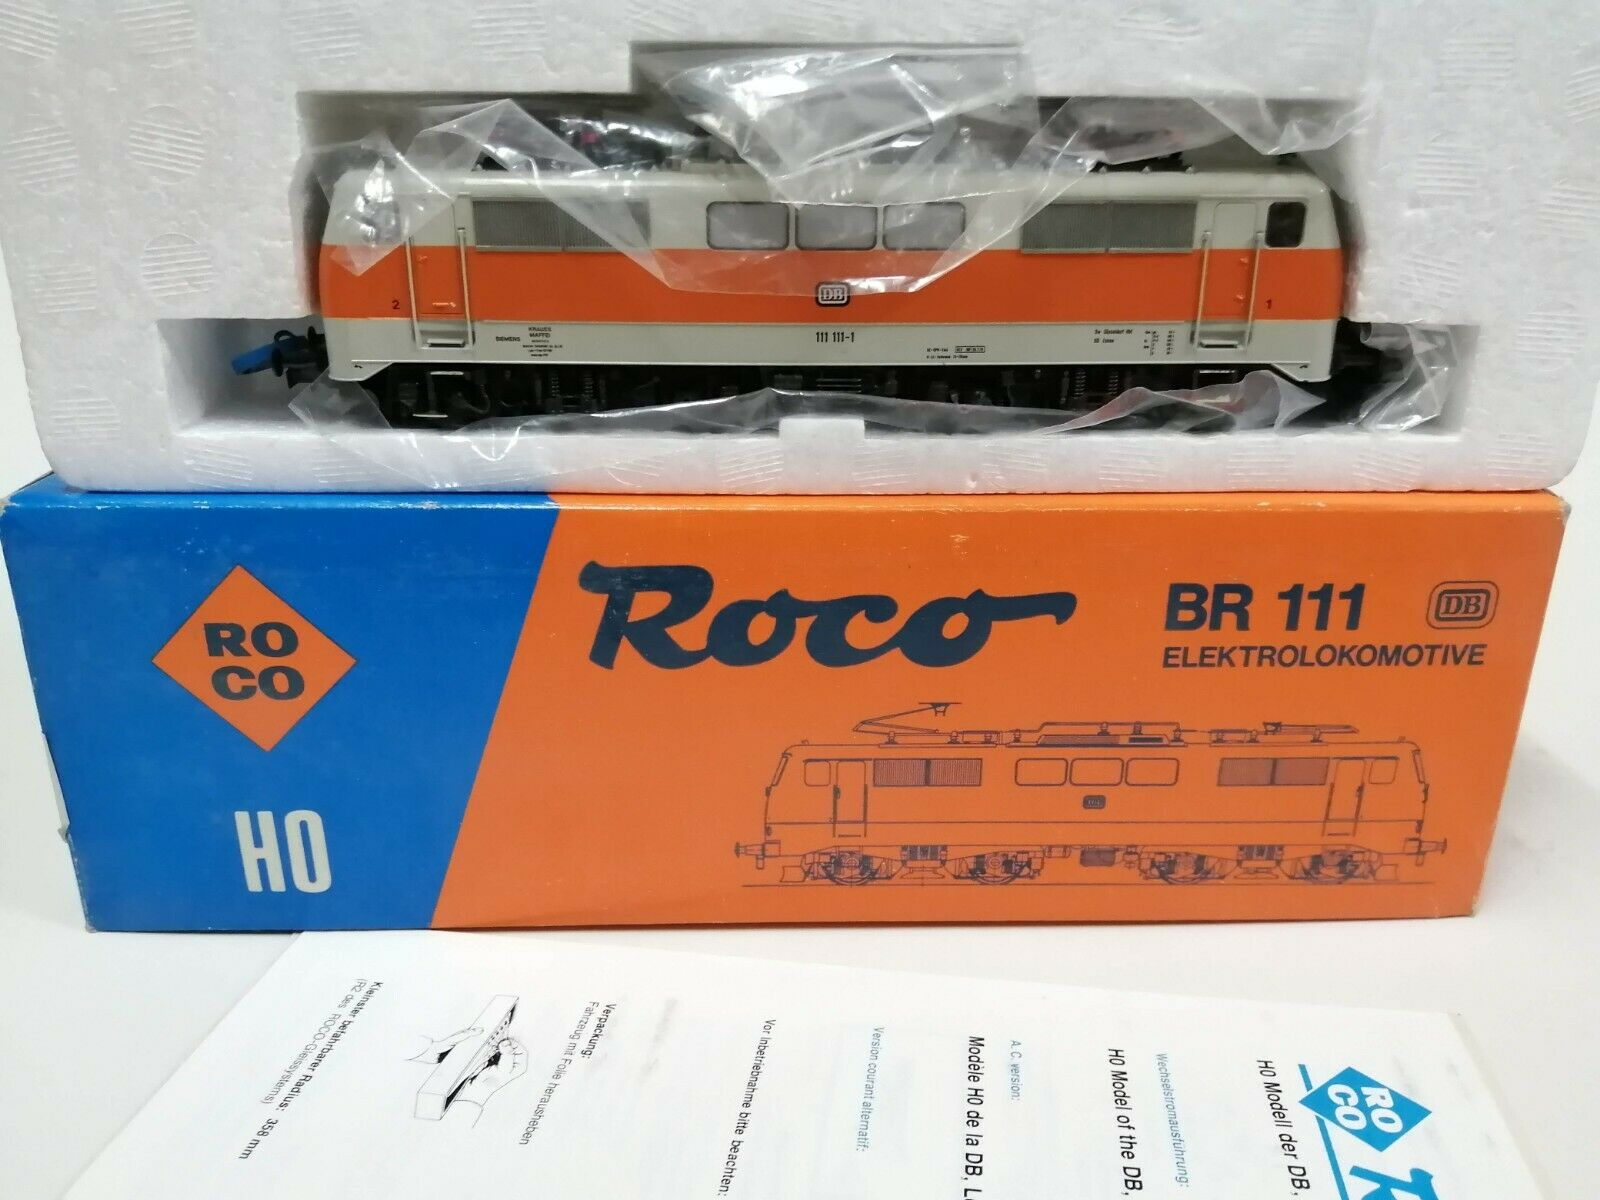 ROCO 4133b ELok BR 111 SBahn della DB OVPcon garanzia